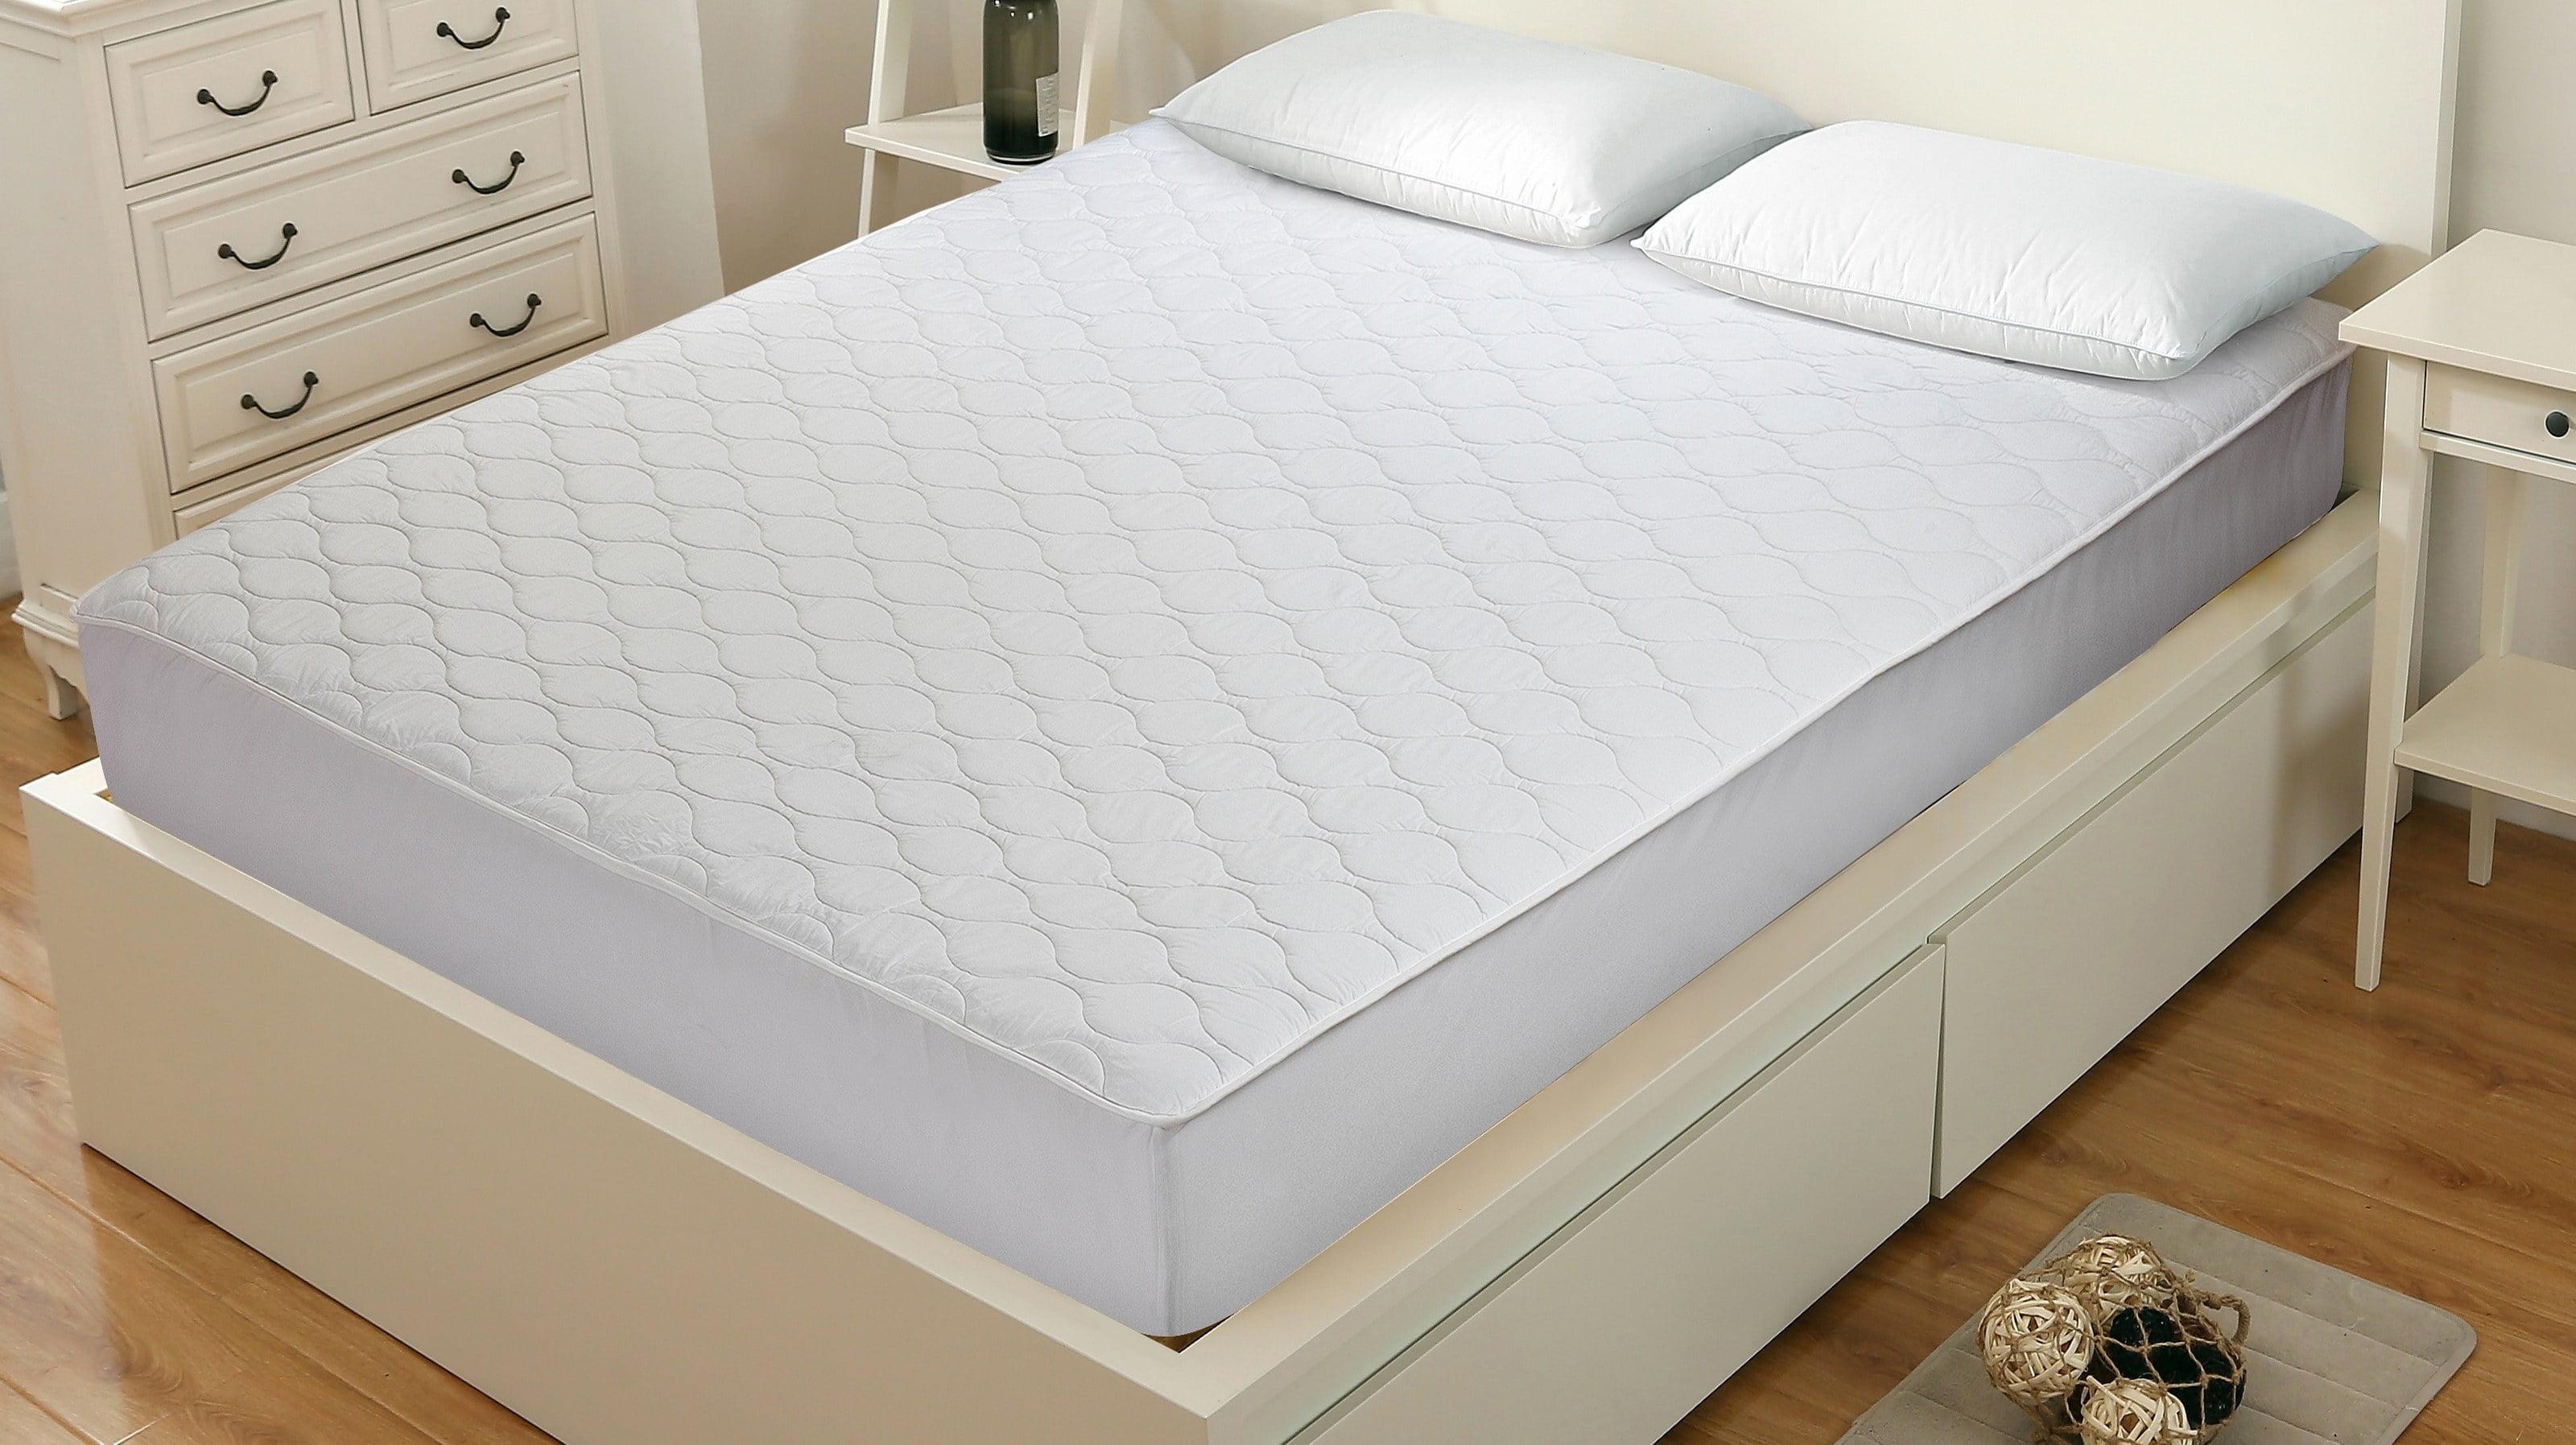 DuPont sorona® mattress pad Twin - Walmart.com - Walmart.com